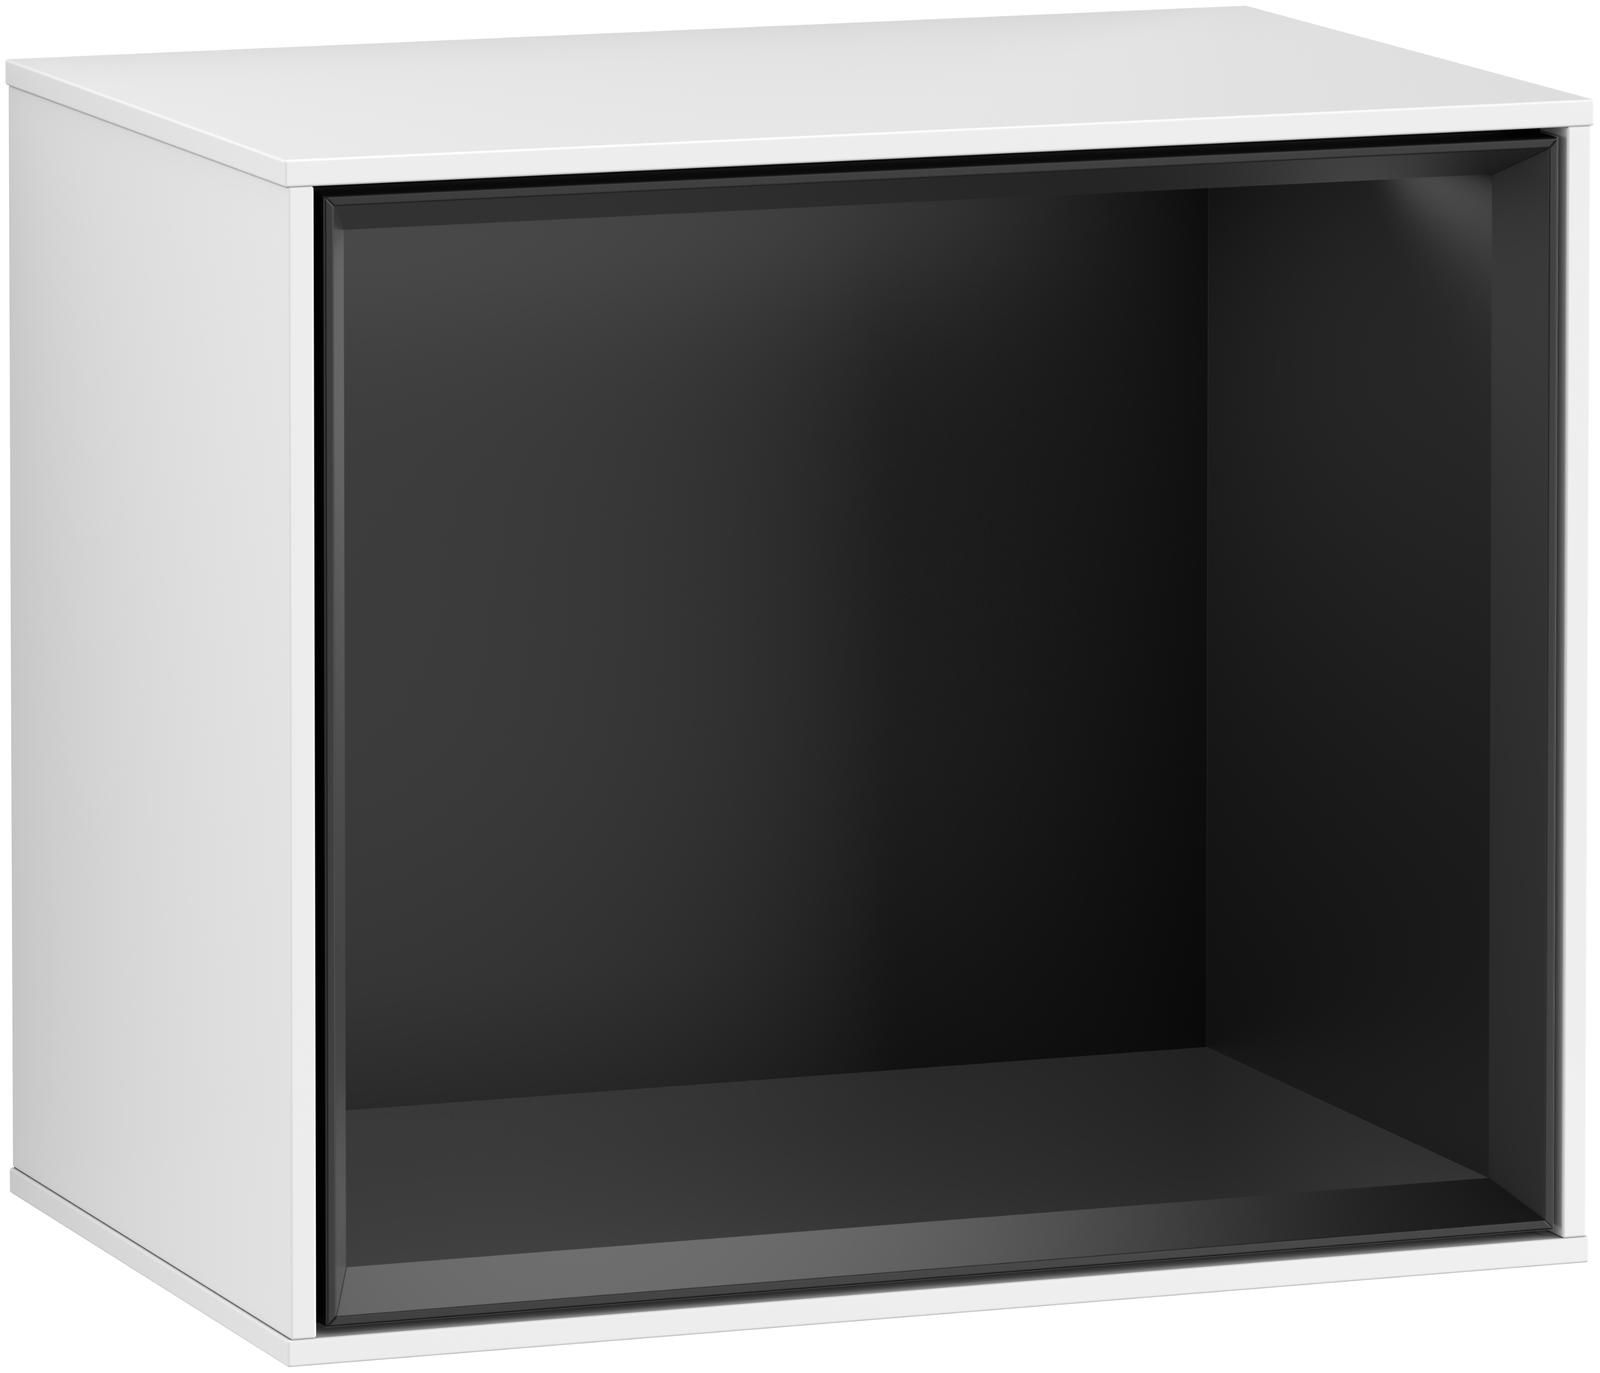 Villeroy & Boch Finion F59 Regalmodul LED-Beleuchtung B:41,8xH:35,6xT:27cm Front, Korpus: Glossy White Lack, Regal: Black Matt Lacquer F590PDGF